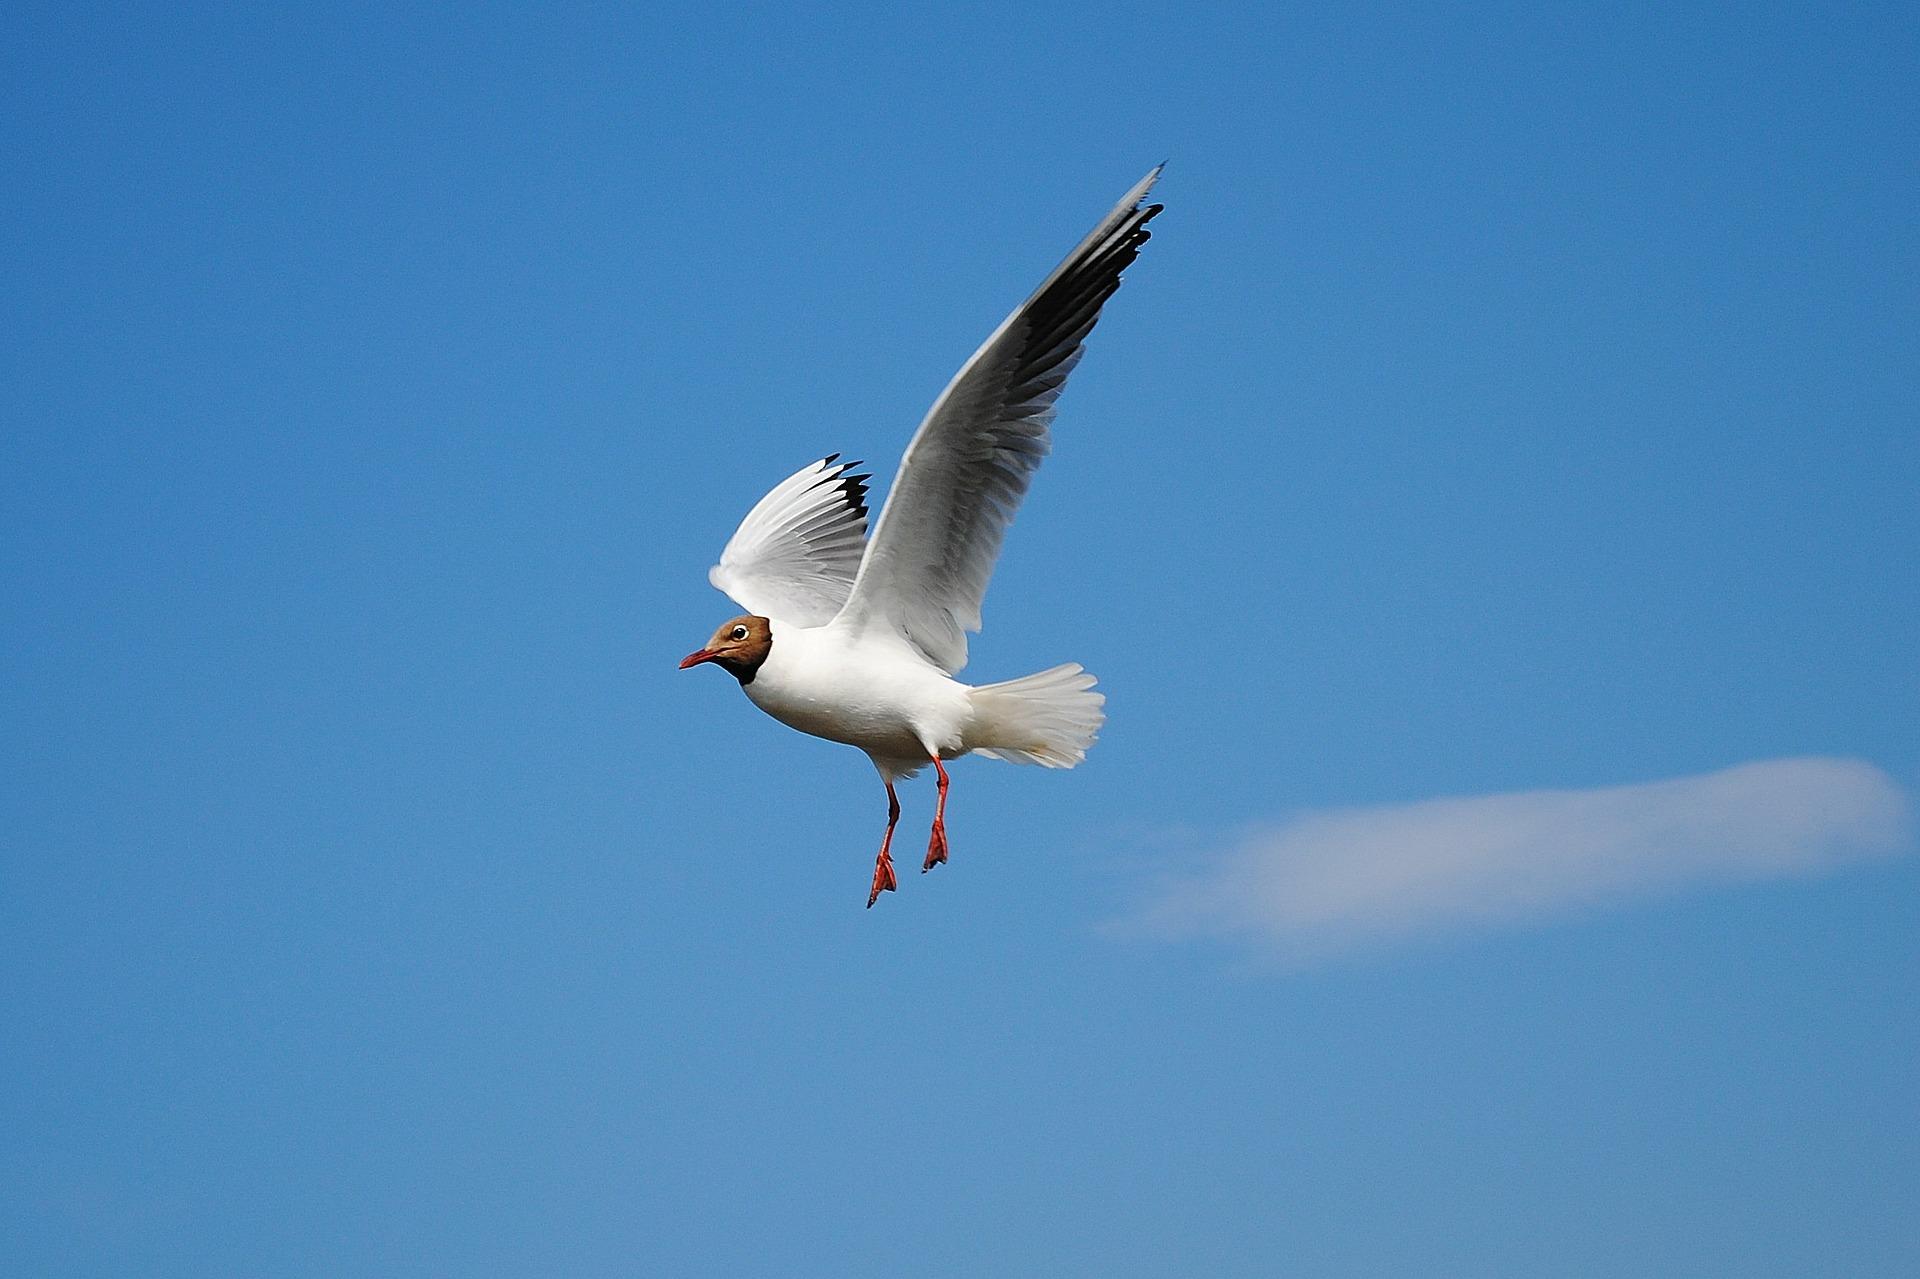 seagull-279645_1920.jpg